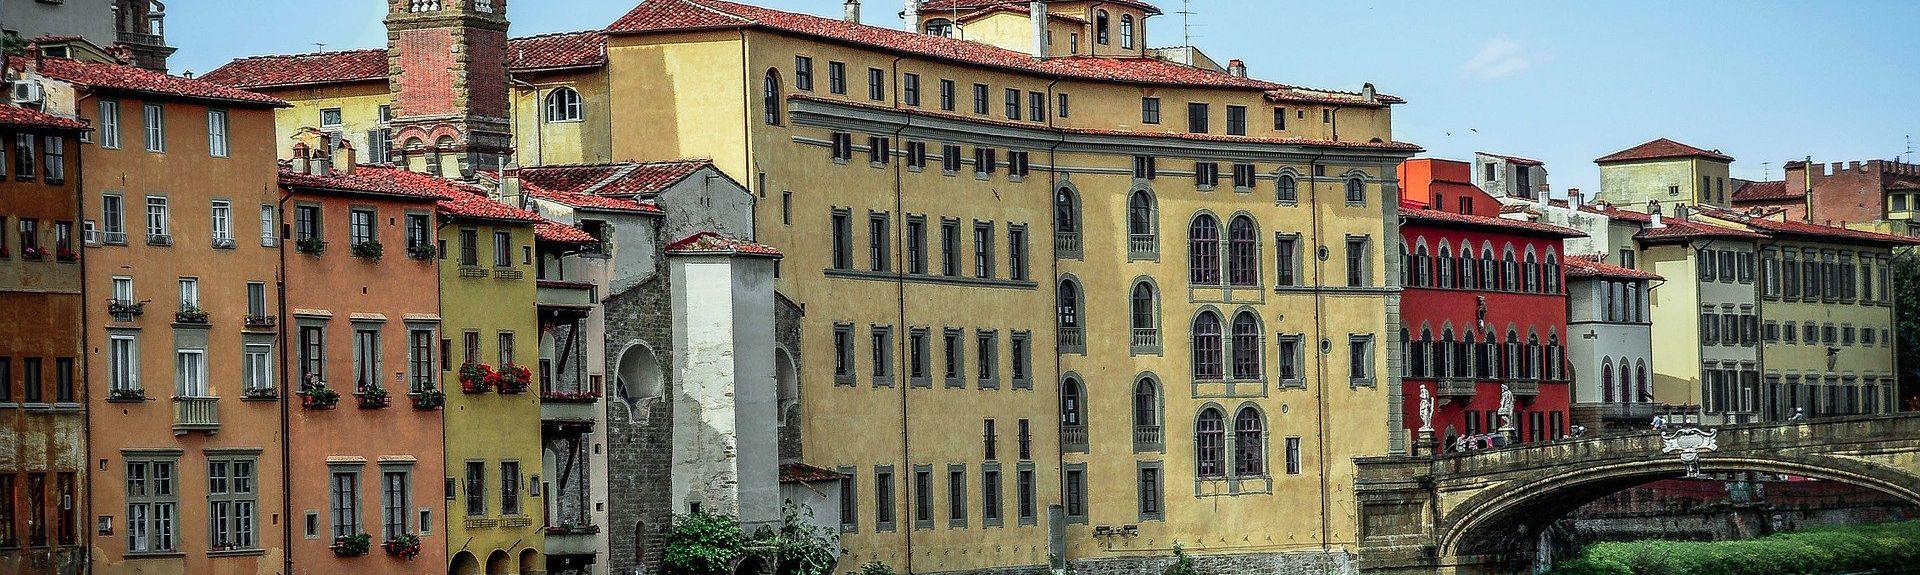 Maiano, Metropolitan City of Florence, Tuscany, Italy